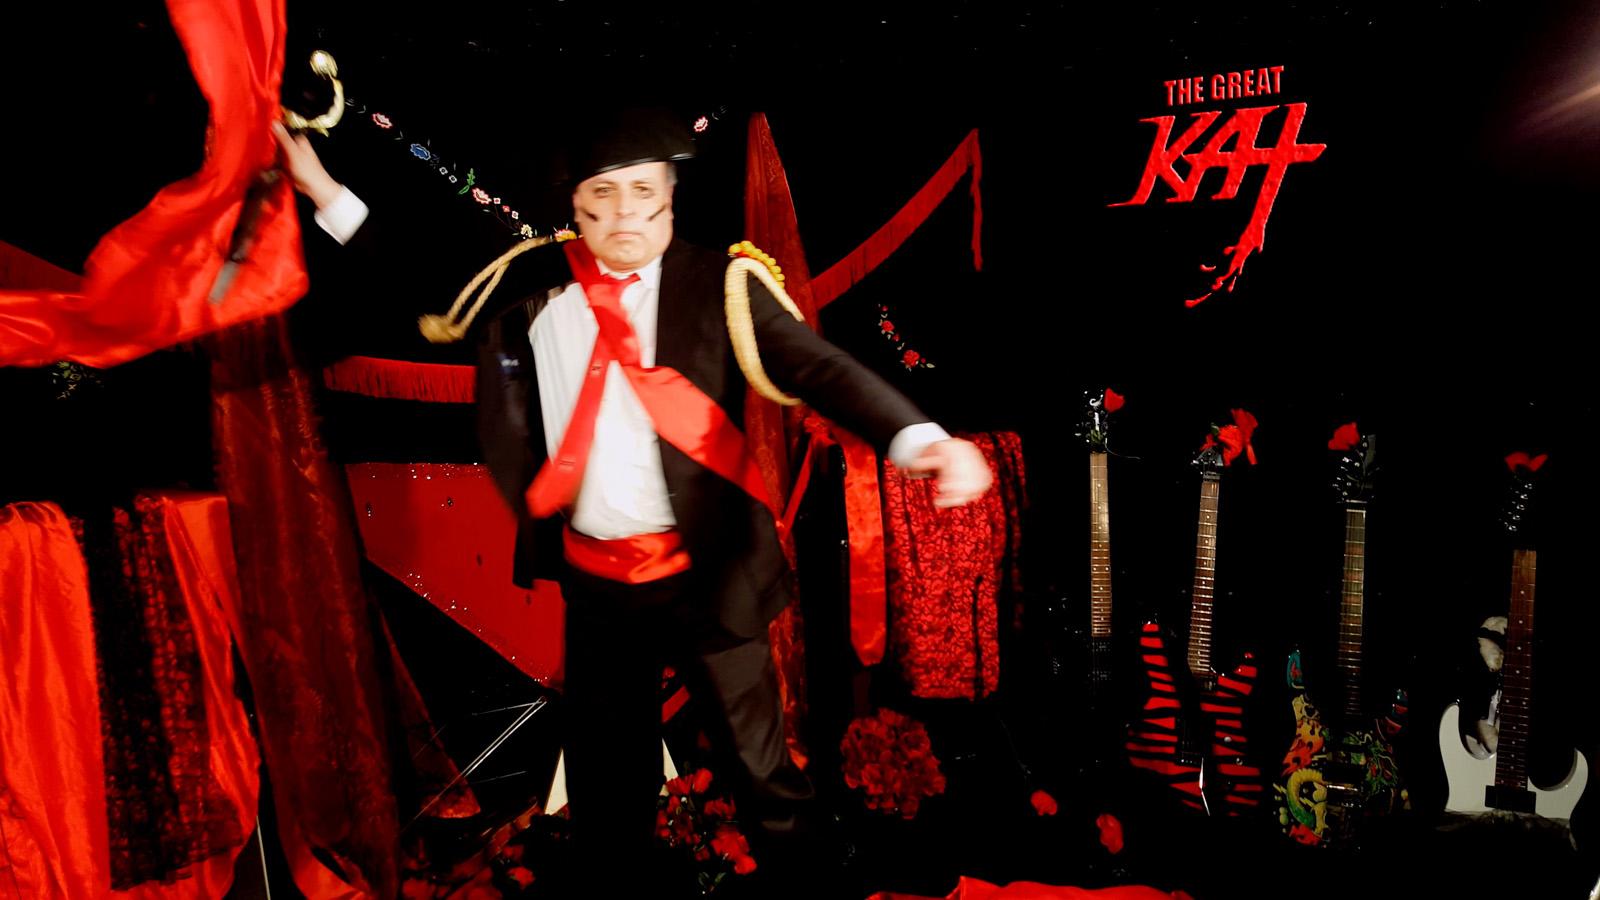 "Don José BULLFIGHTER! From The Great Kat's SARASATE'S ""CARMEN FANTASY"" MUSIC VIDEO!!"